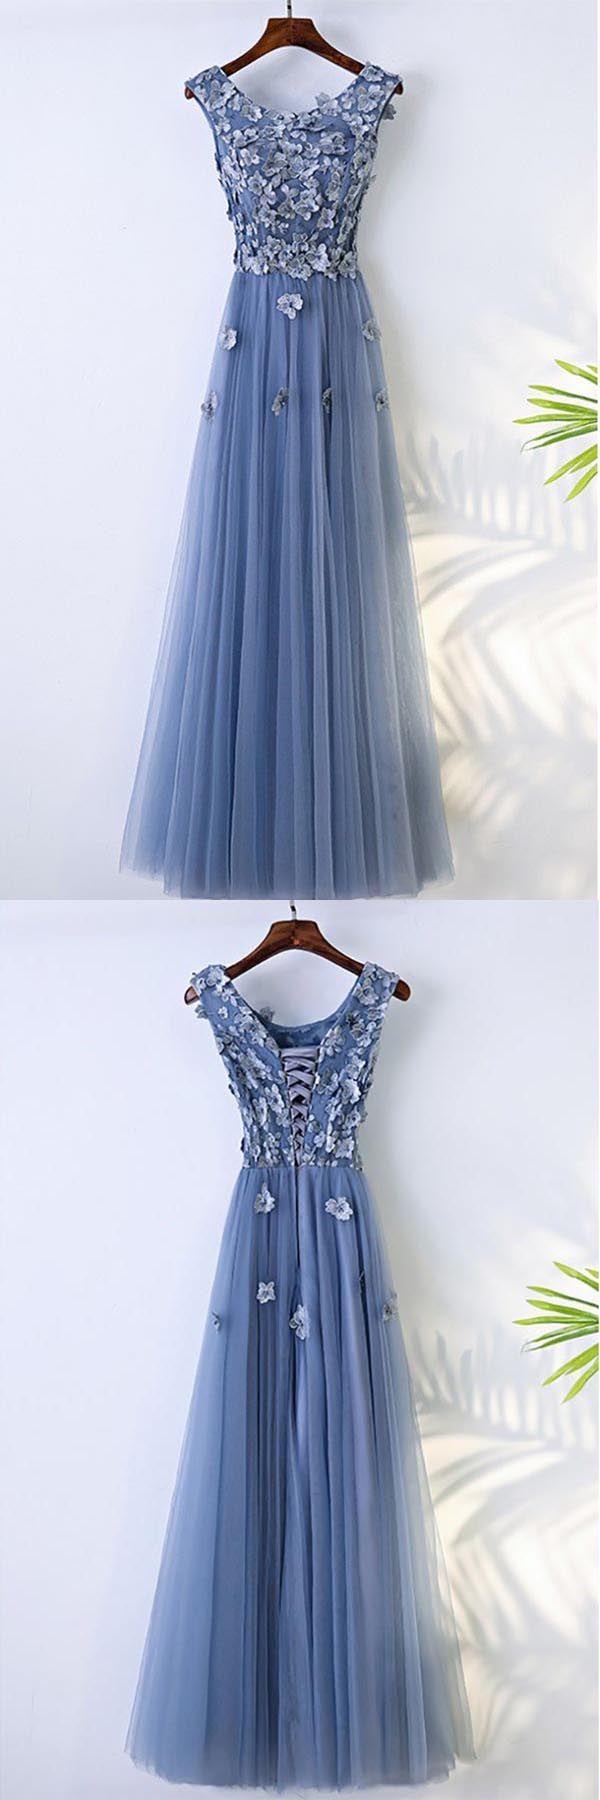 Aline blue flowy prom dress long with flower petals pg dresses